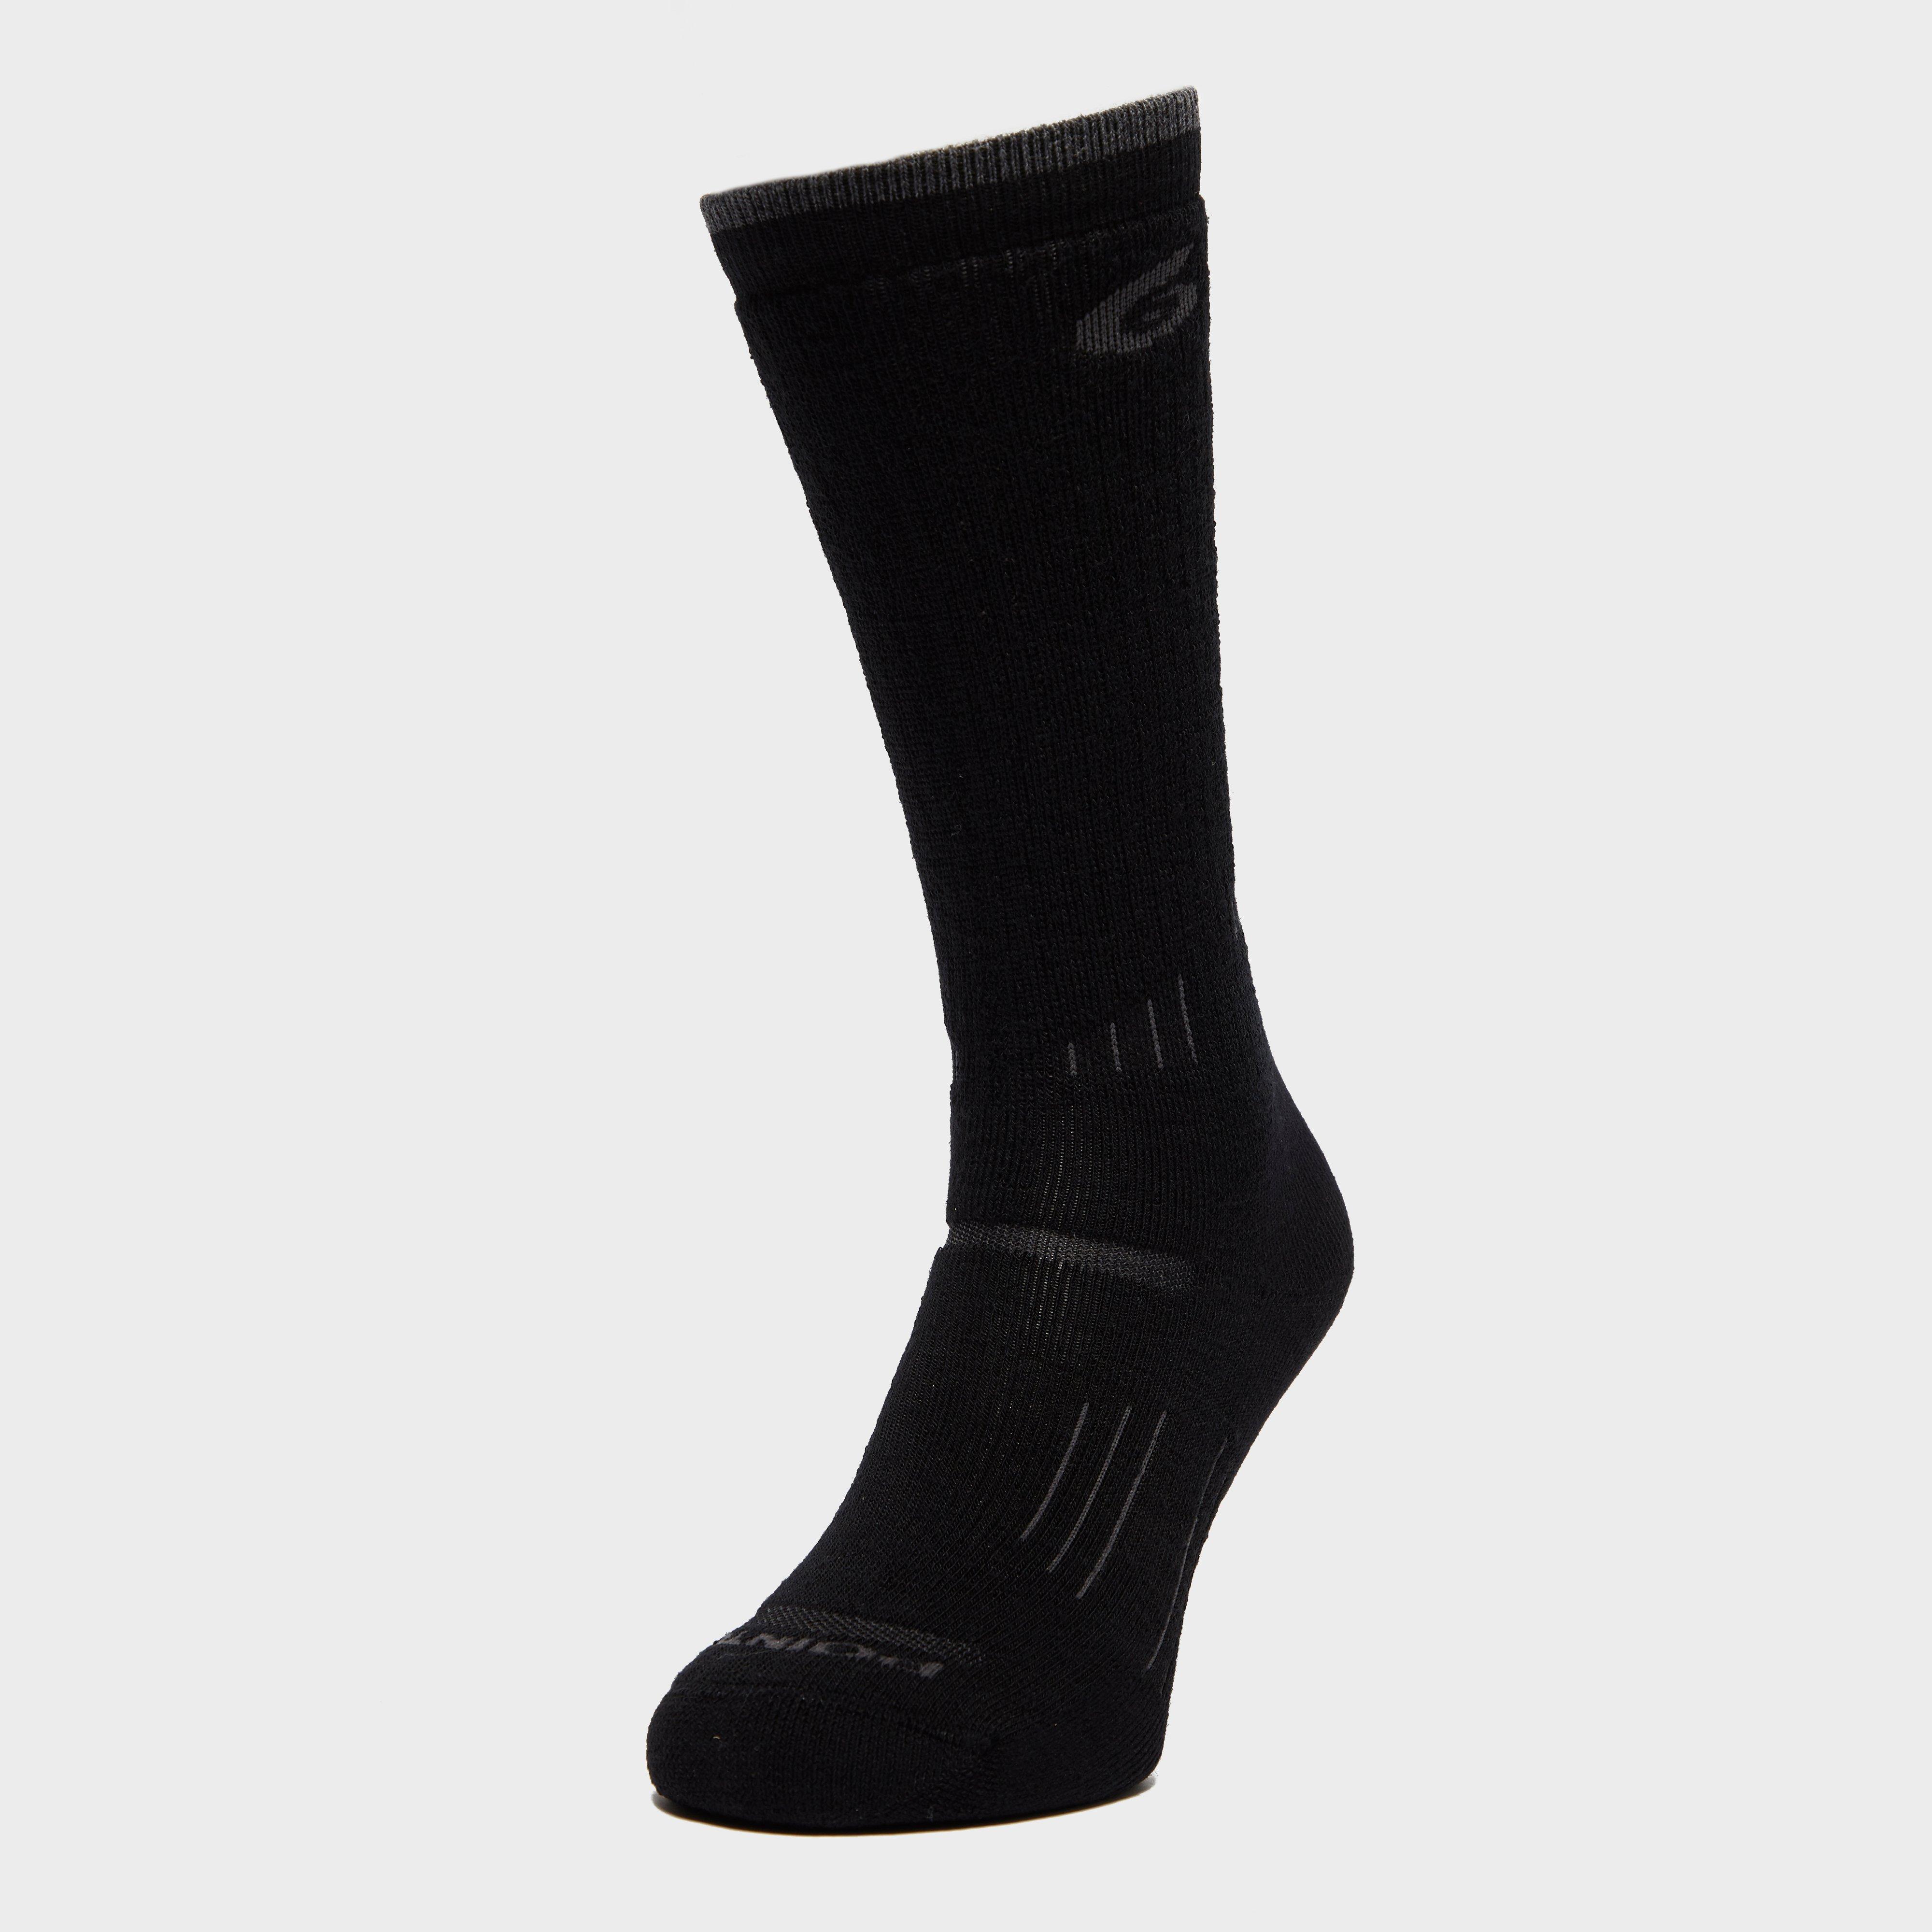 Point6 Women's Hike Medium Socks, Black